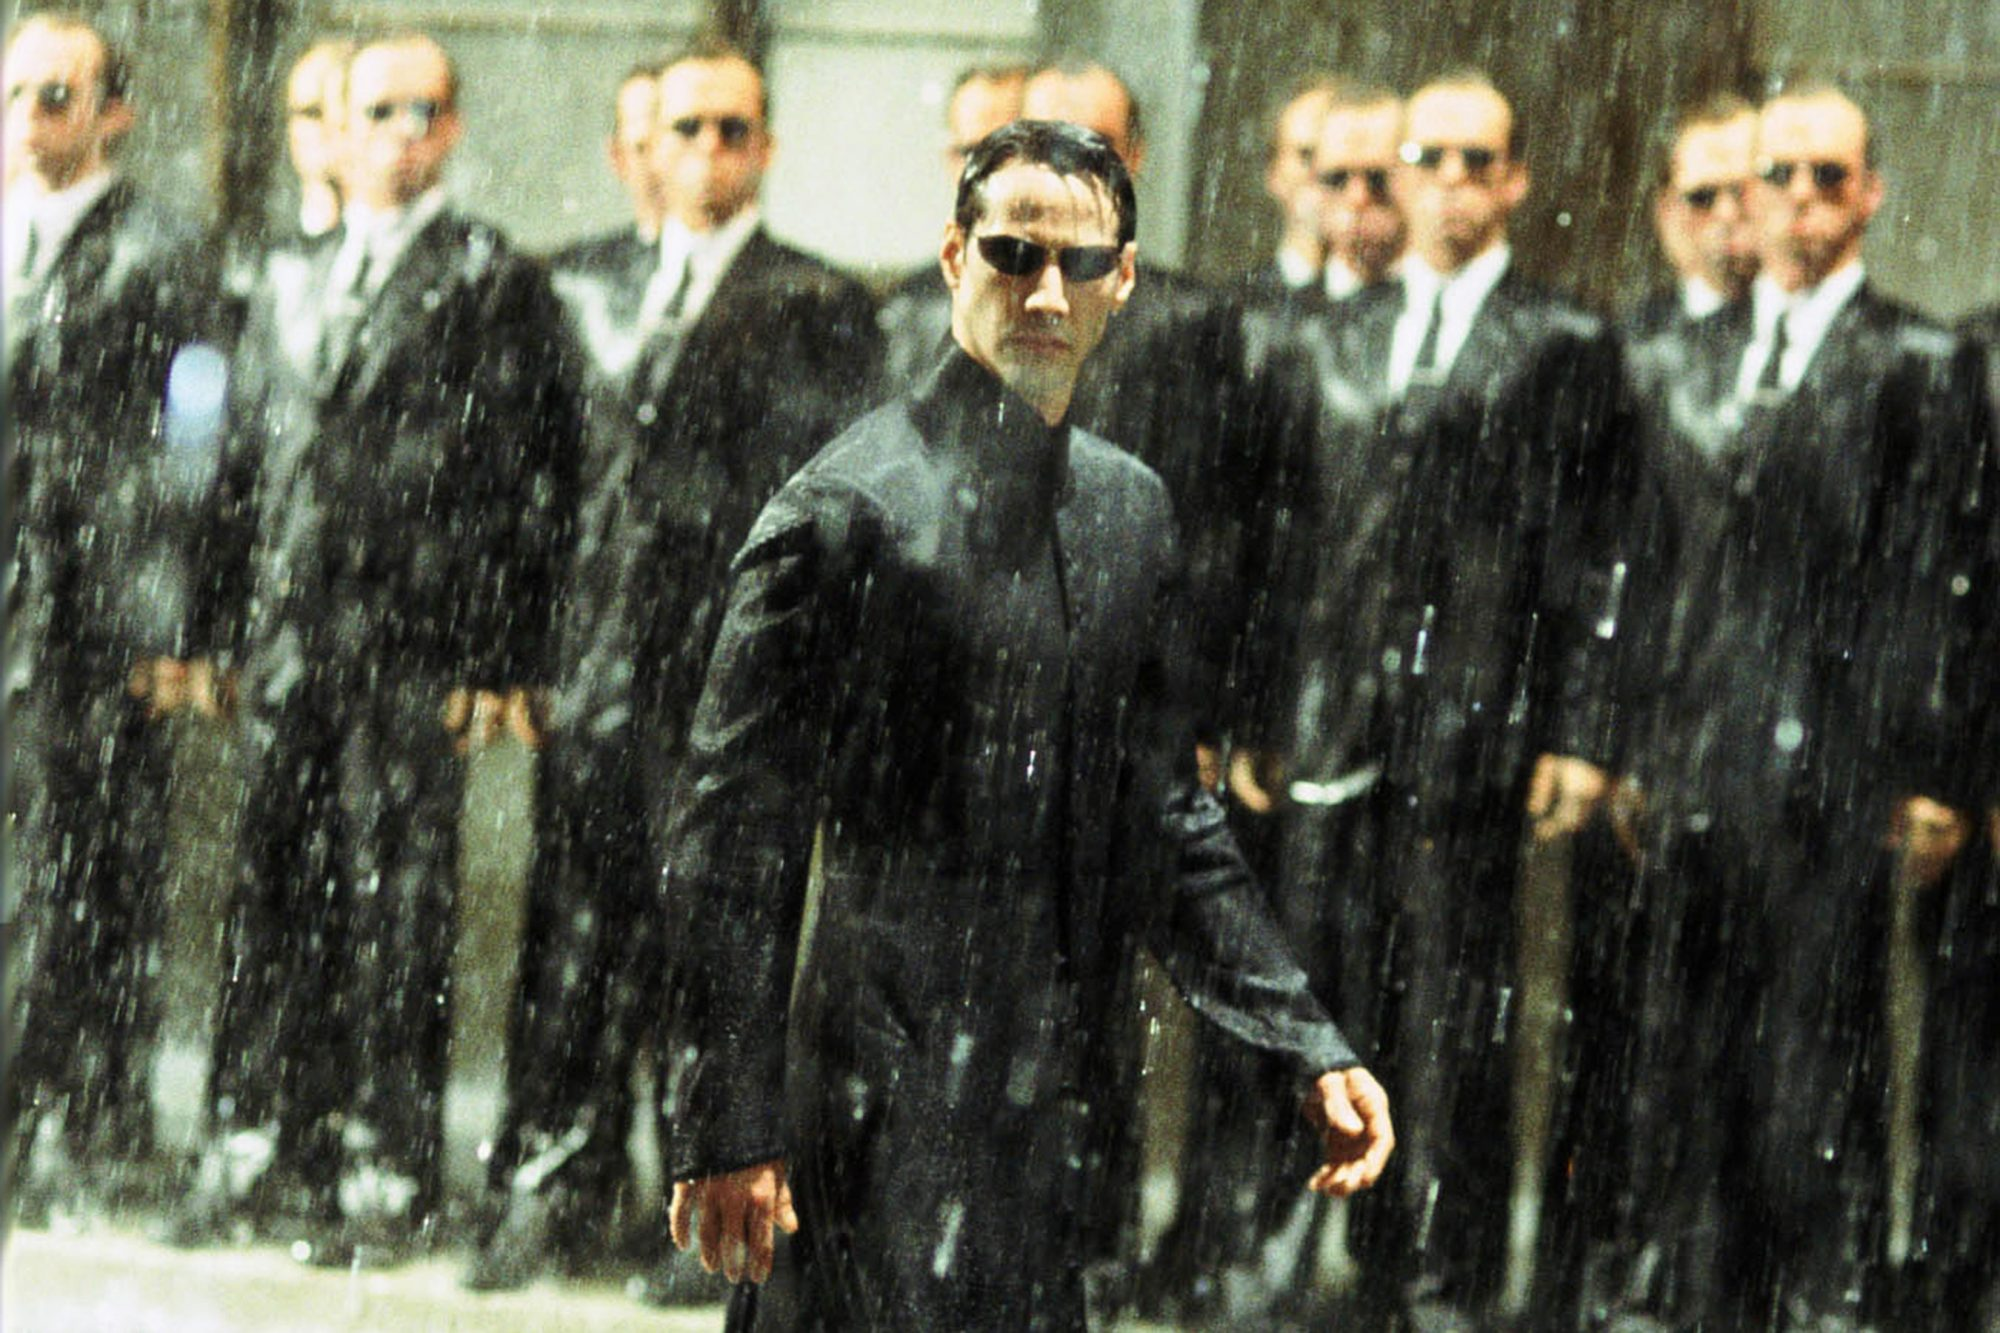 Matrix Revolutions (2003)Keanu Reeves